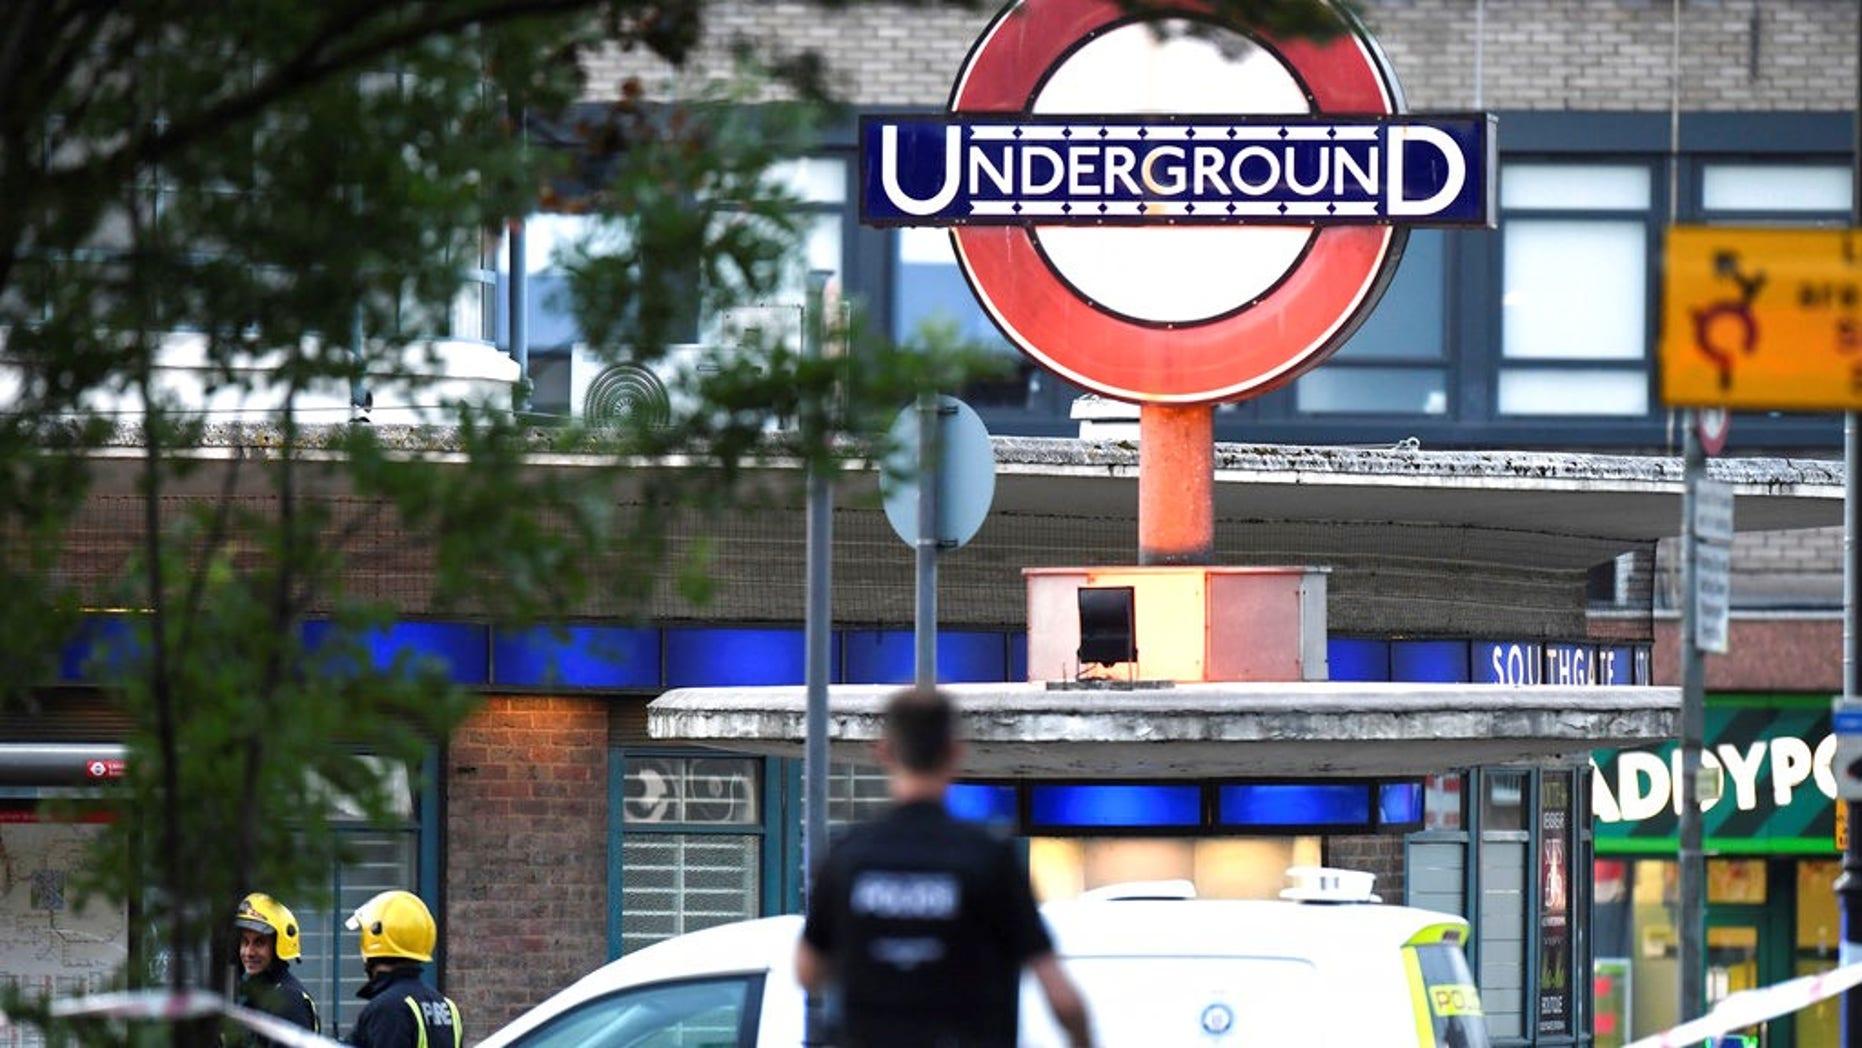 UK deploys 500 transit police to prevent unnecessary travel amid coronavirus outbreak